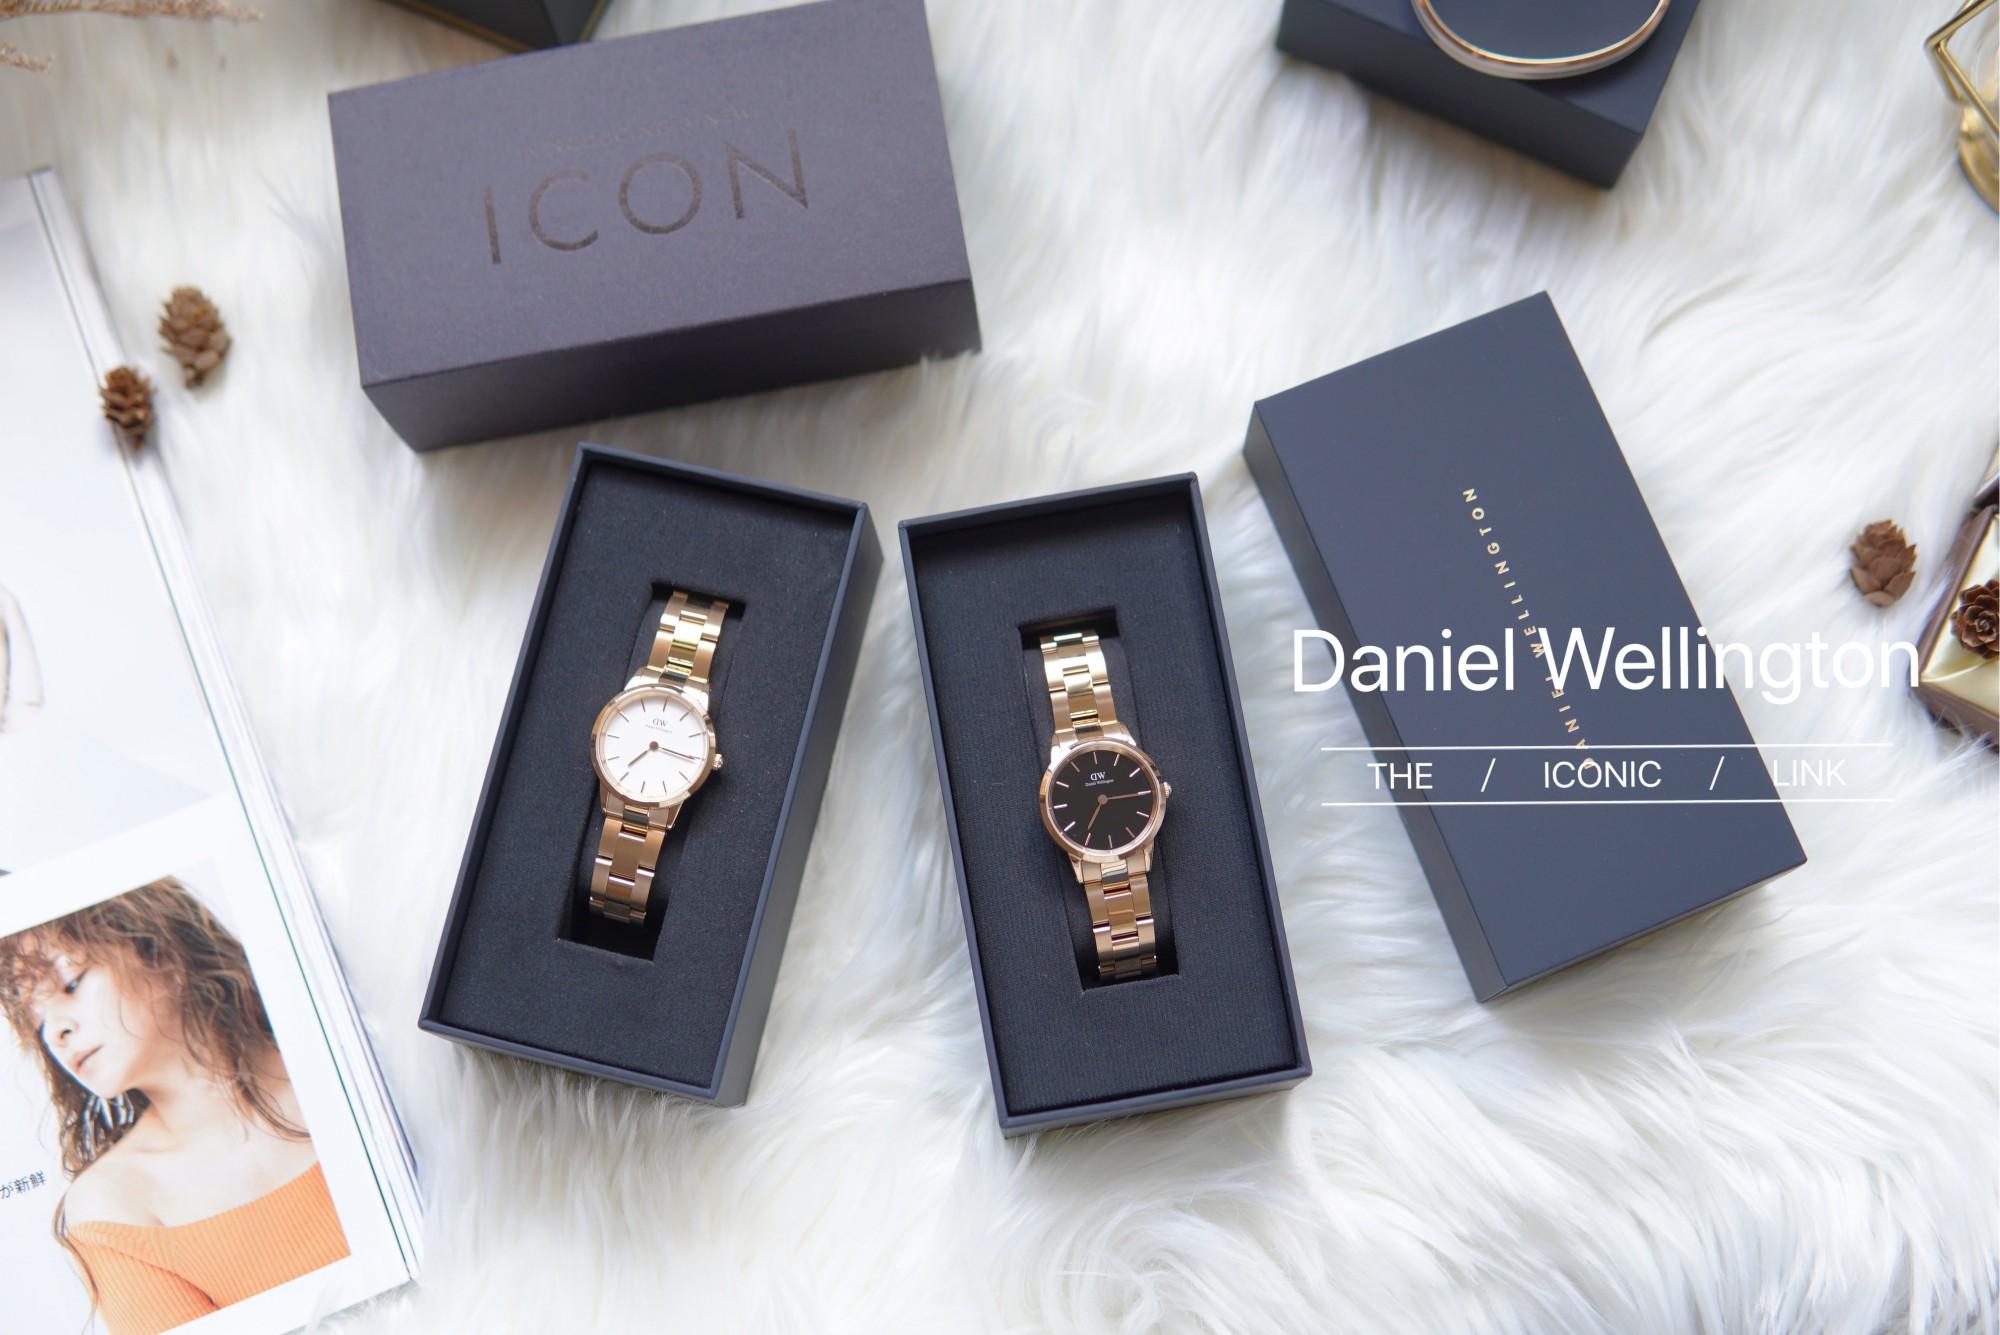 ☆【DW折扣碼】聖經女神錶!Daniel Wellington ICONIC LINK手錶。2020折扣碼:kaikai00603 @凱的日本食尚日記